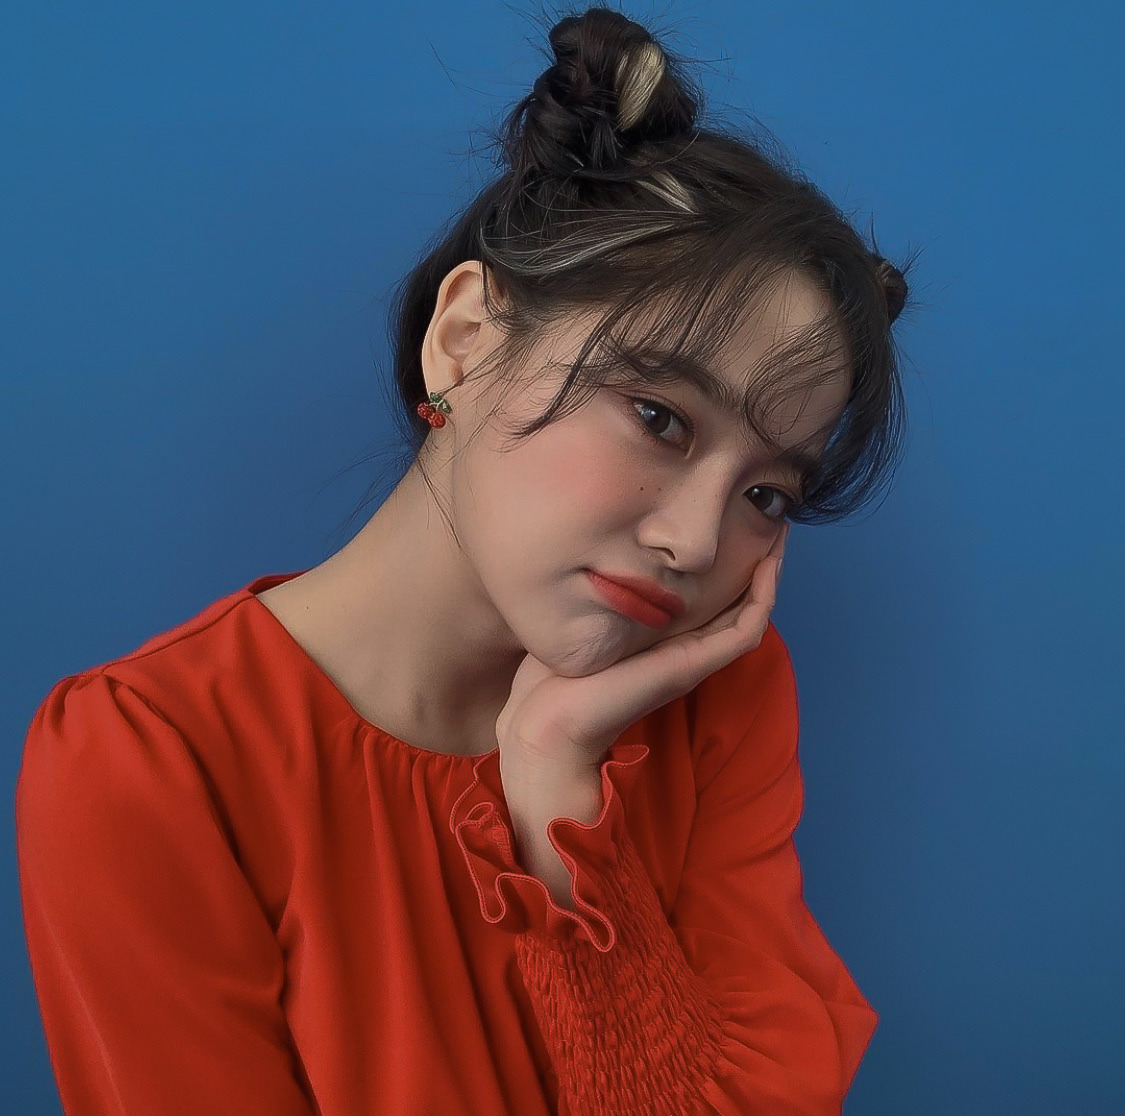 Voir un profil - Minji Byeon 1iIJMVaQ_o